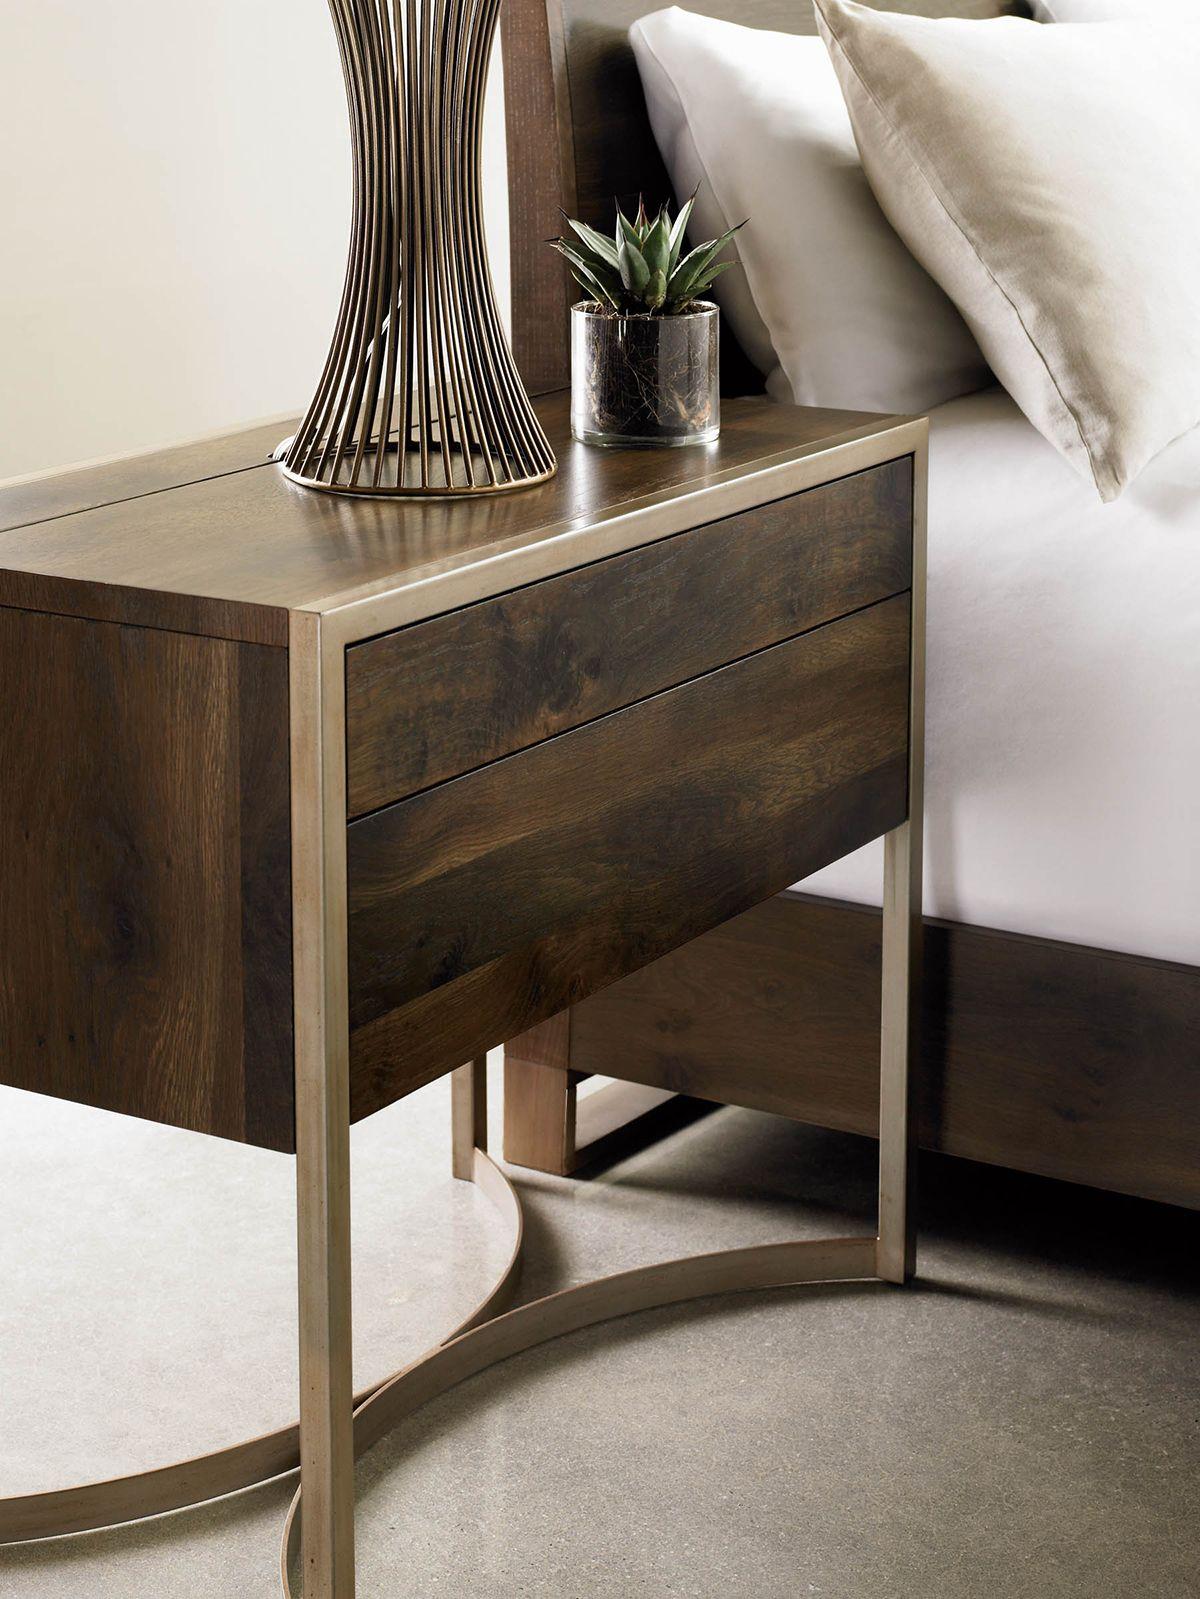 Modern Artisan 2 Drawer Nightstand. This fumed oak and